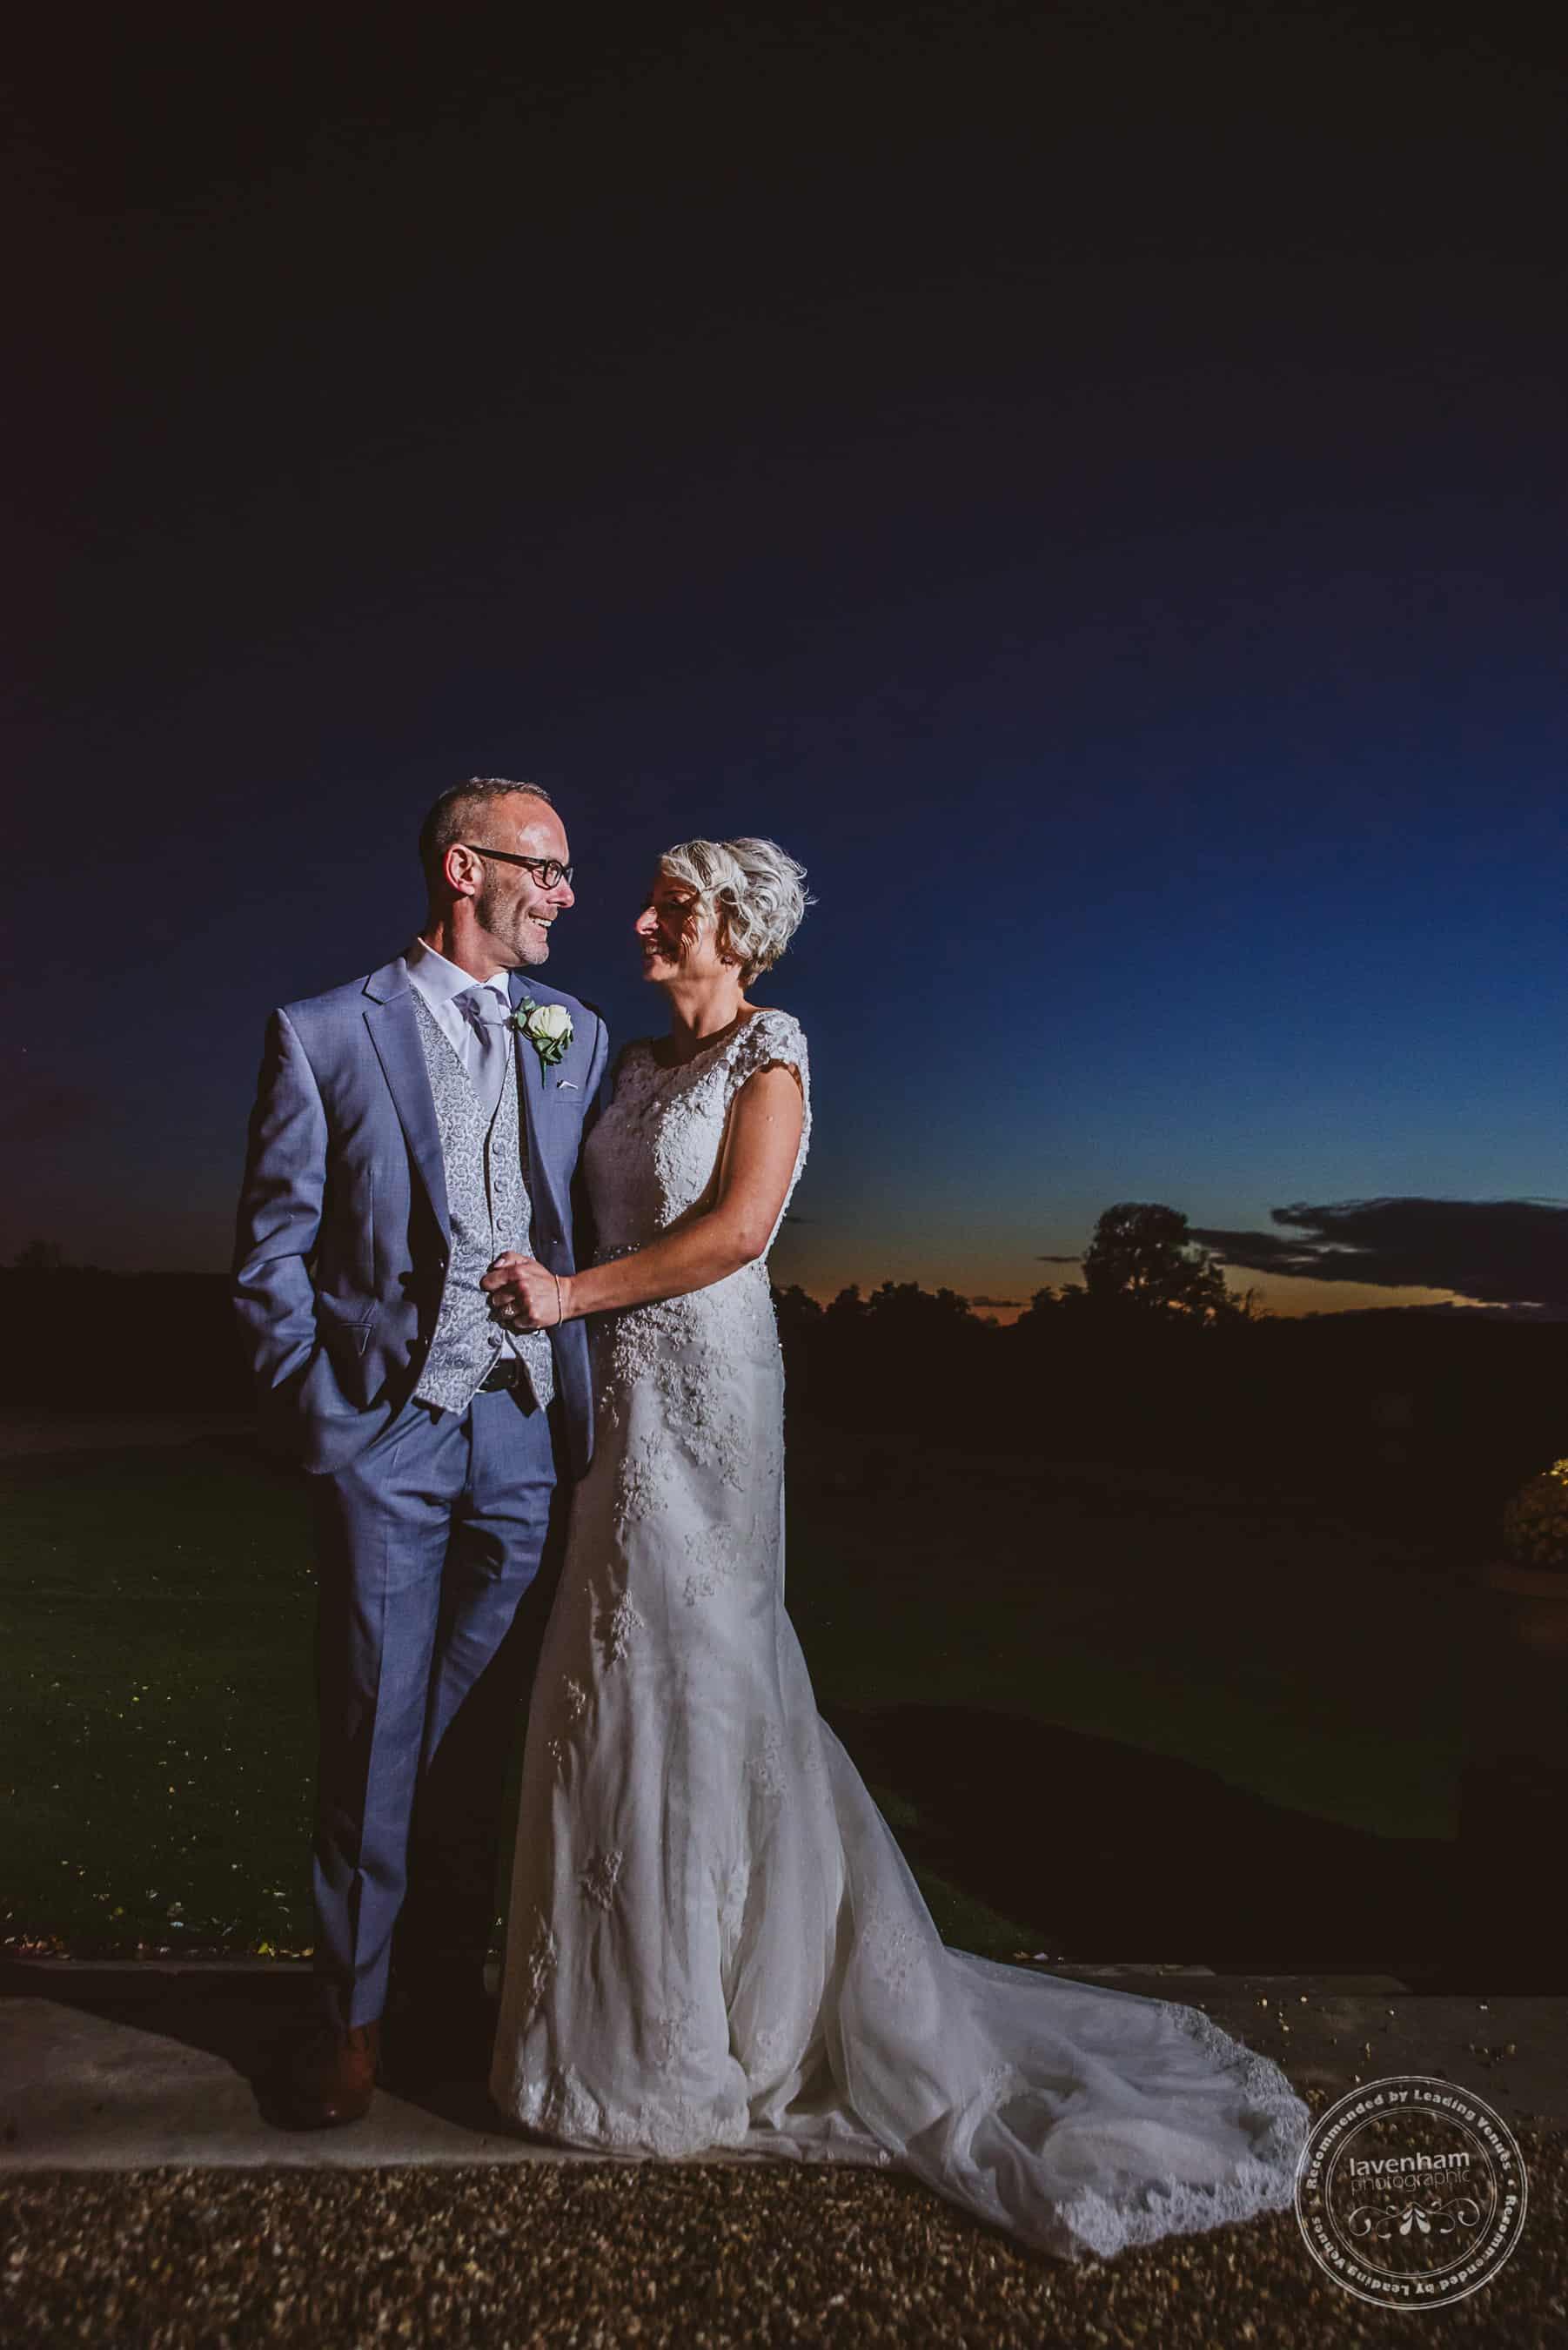 281018 Gosfield Hall Wedding Photography Lavenham Photographic 111